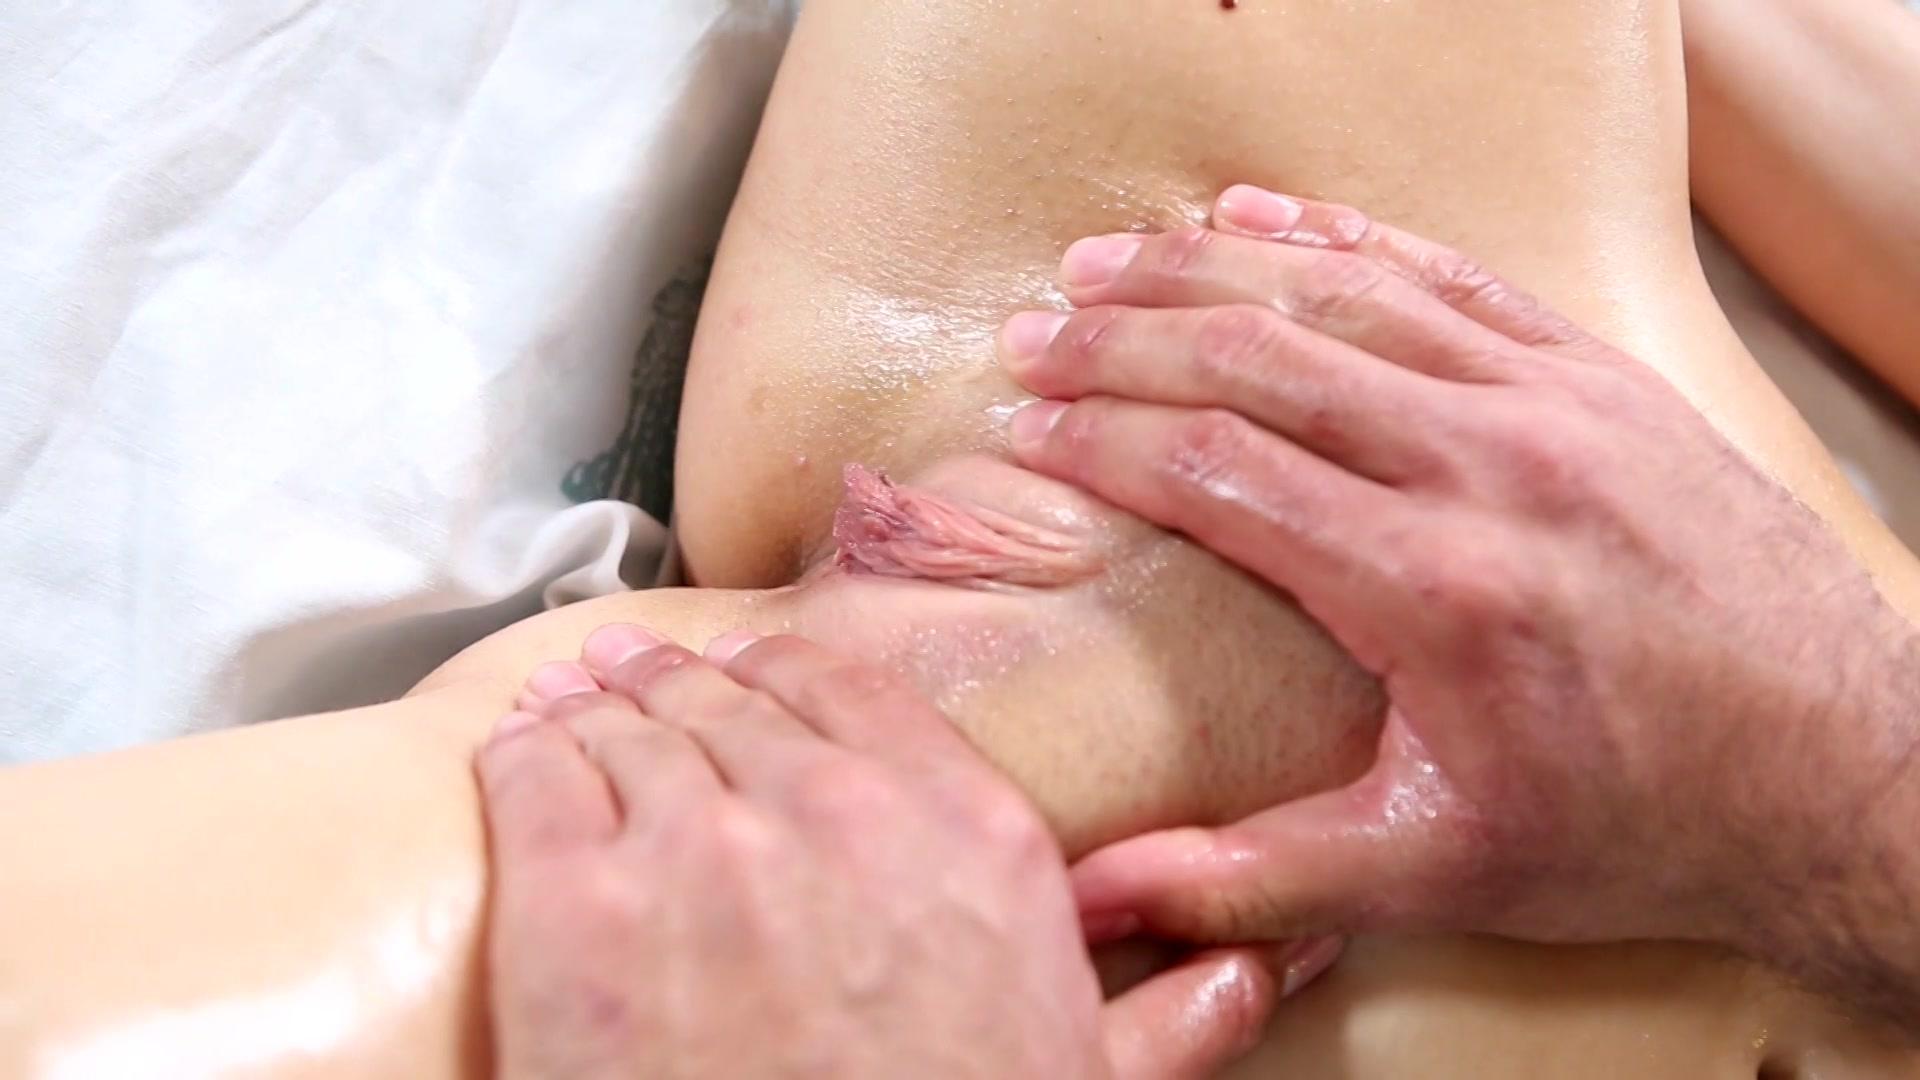 Clitoral massage photo bondage